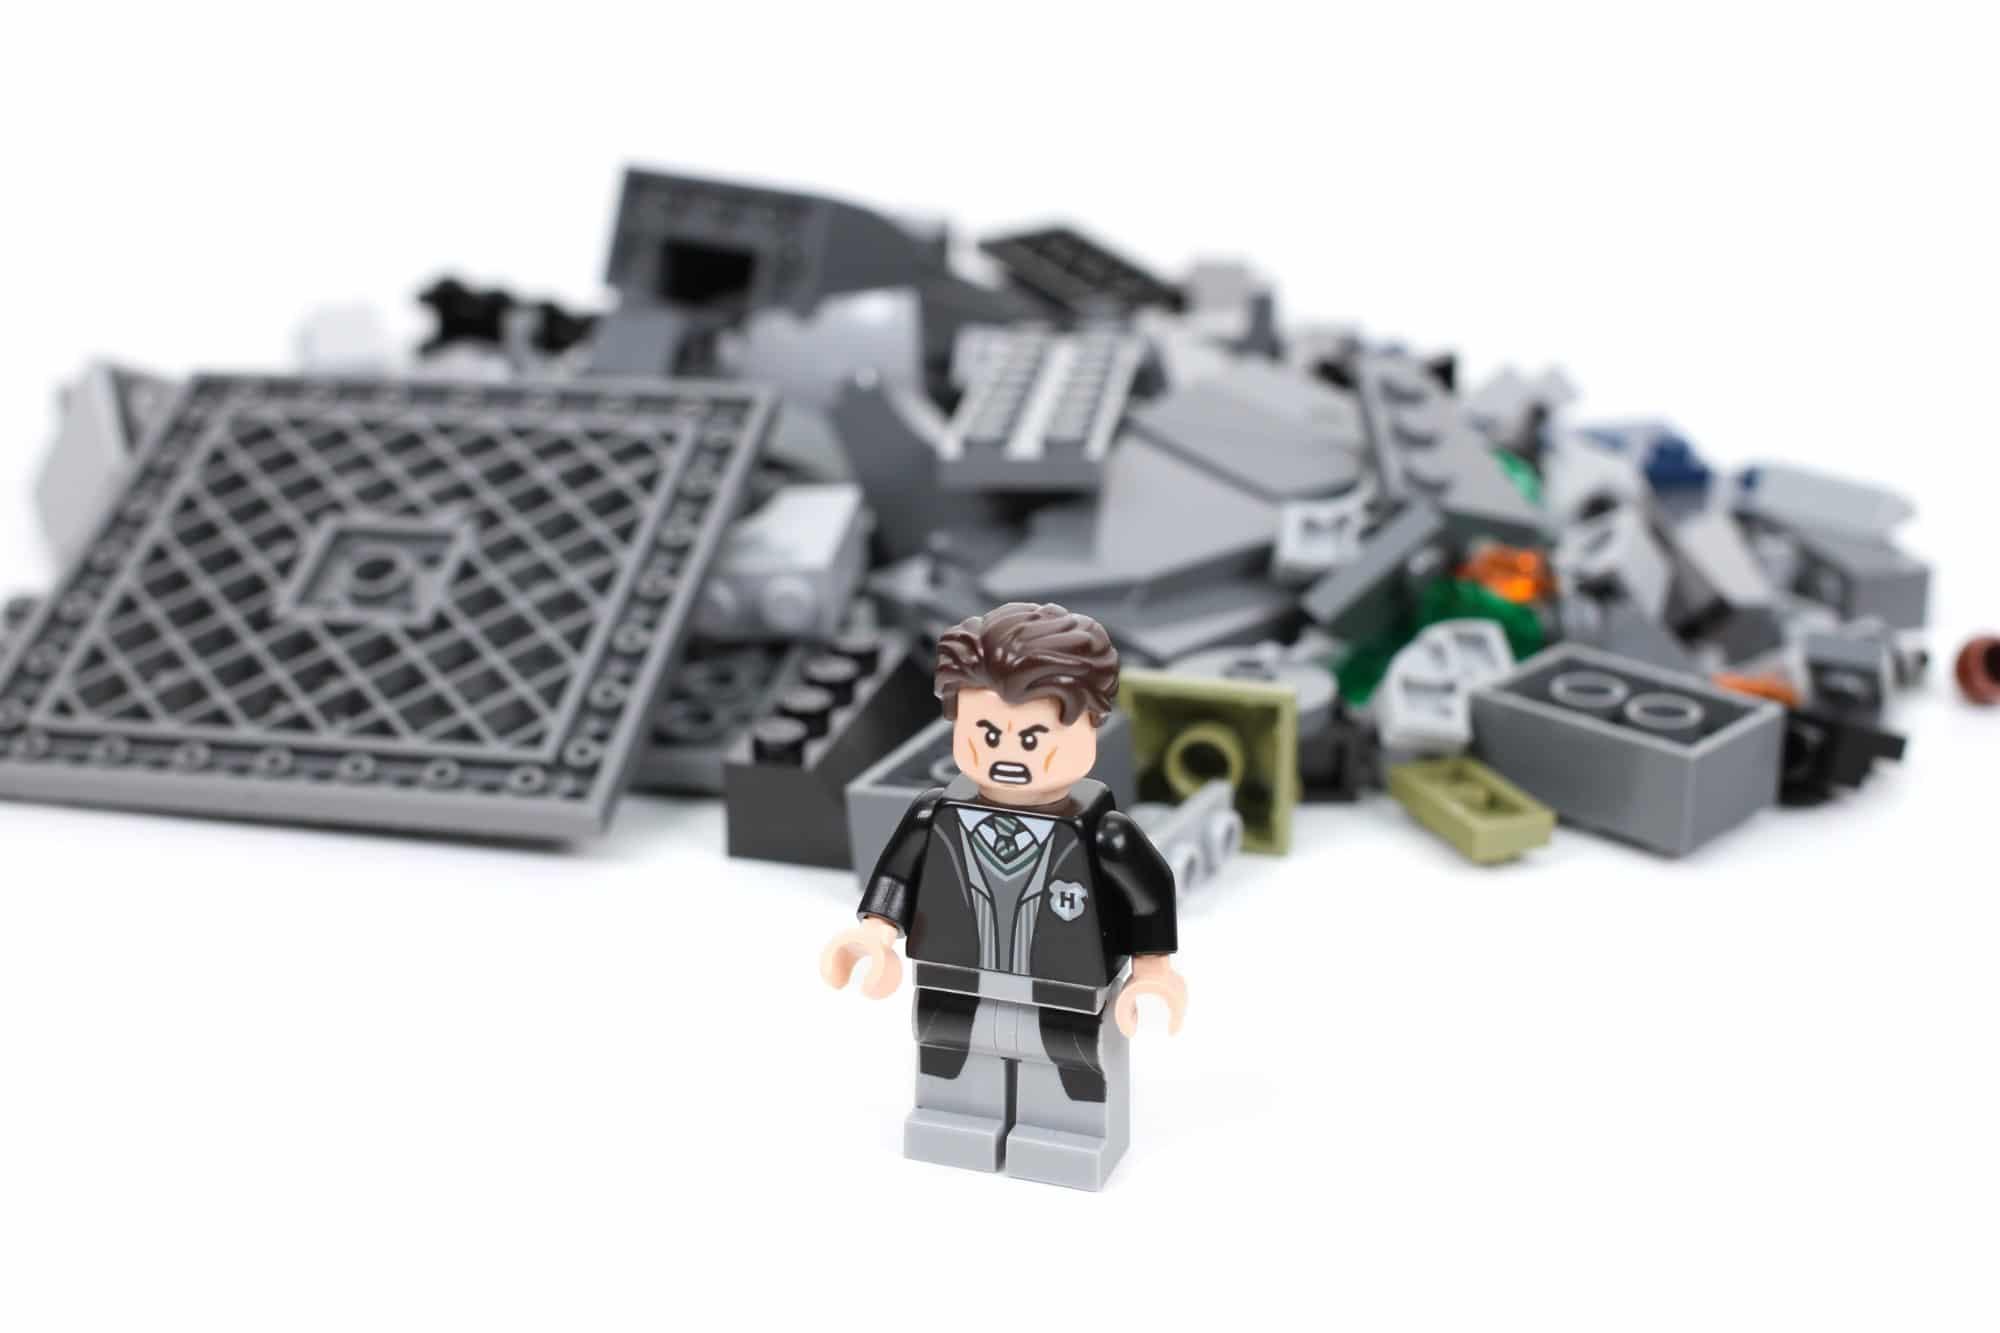 LEGO Harry Potter 76389 Hogwarts Kammer Des Schreckens Schritt 8 1